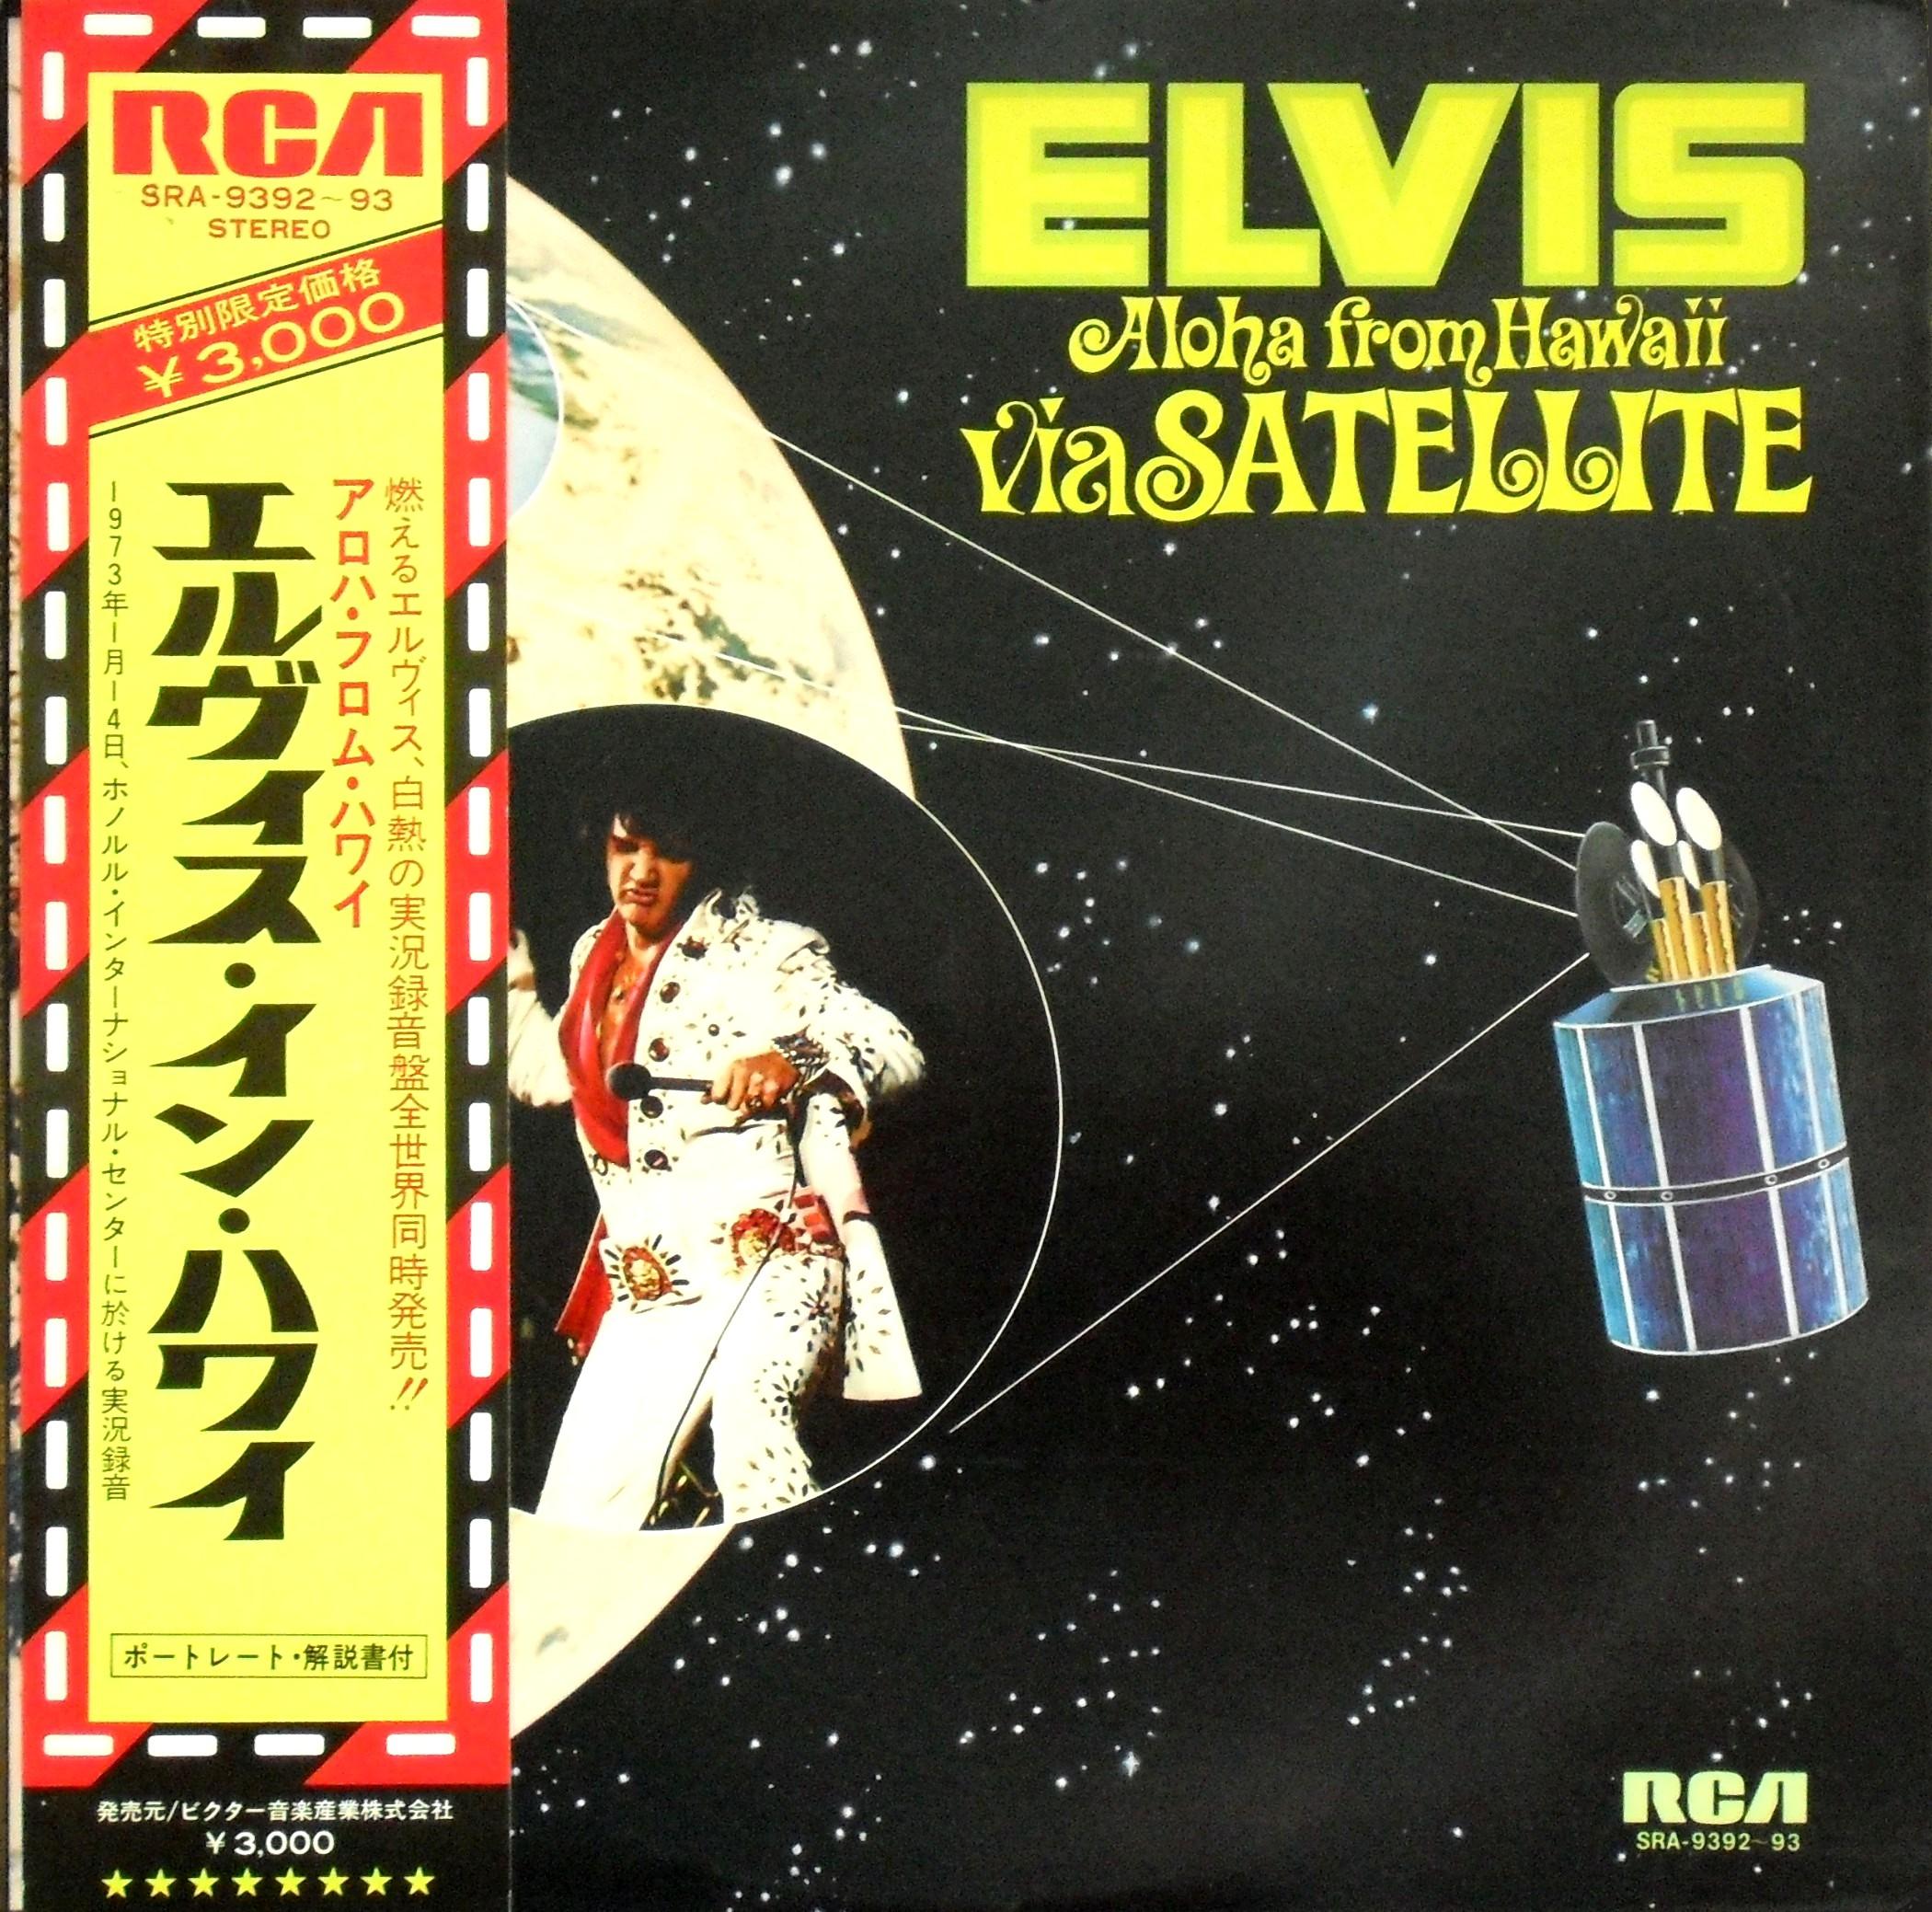 Diskografie Japan 1955 - 1977 Sra-9392ndqpr